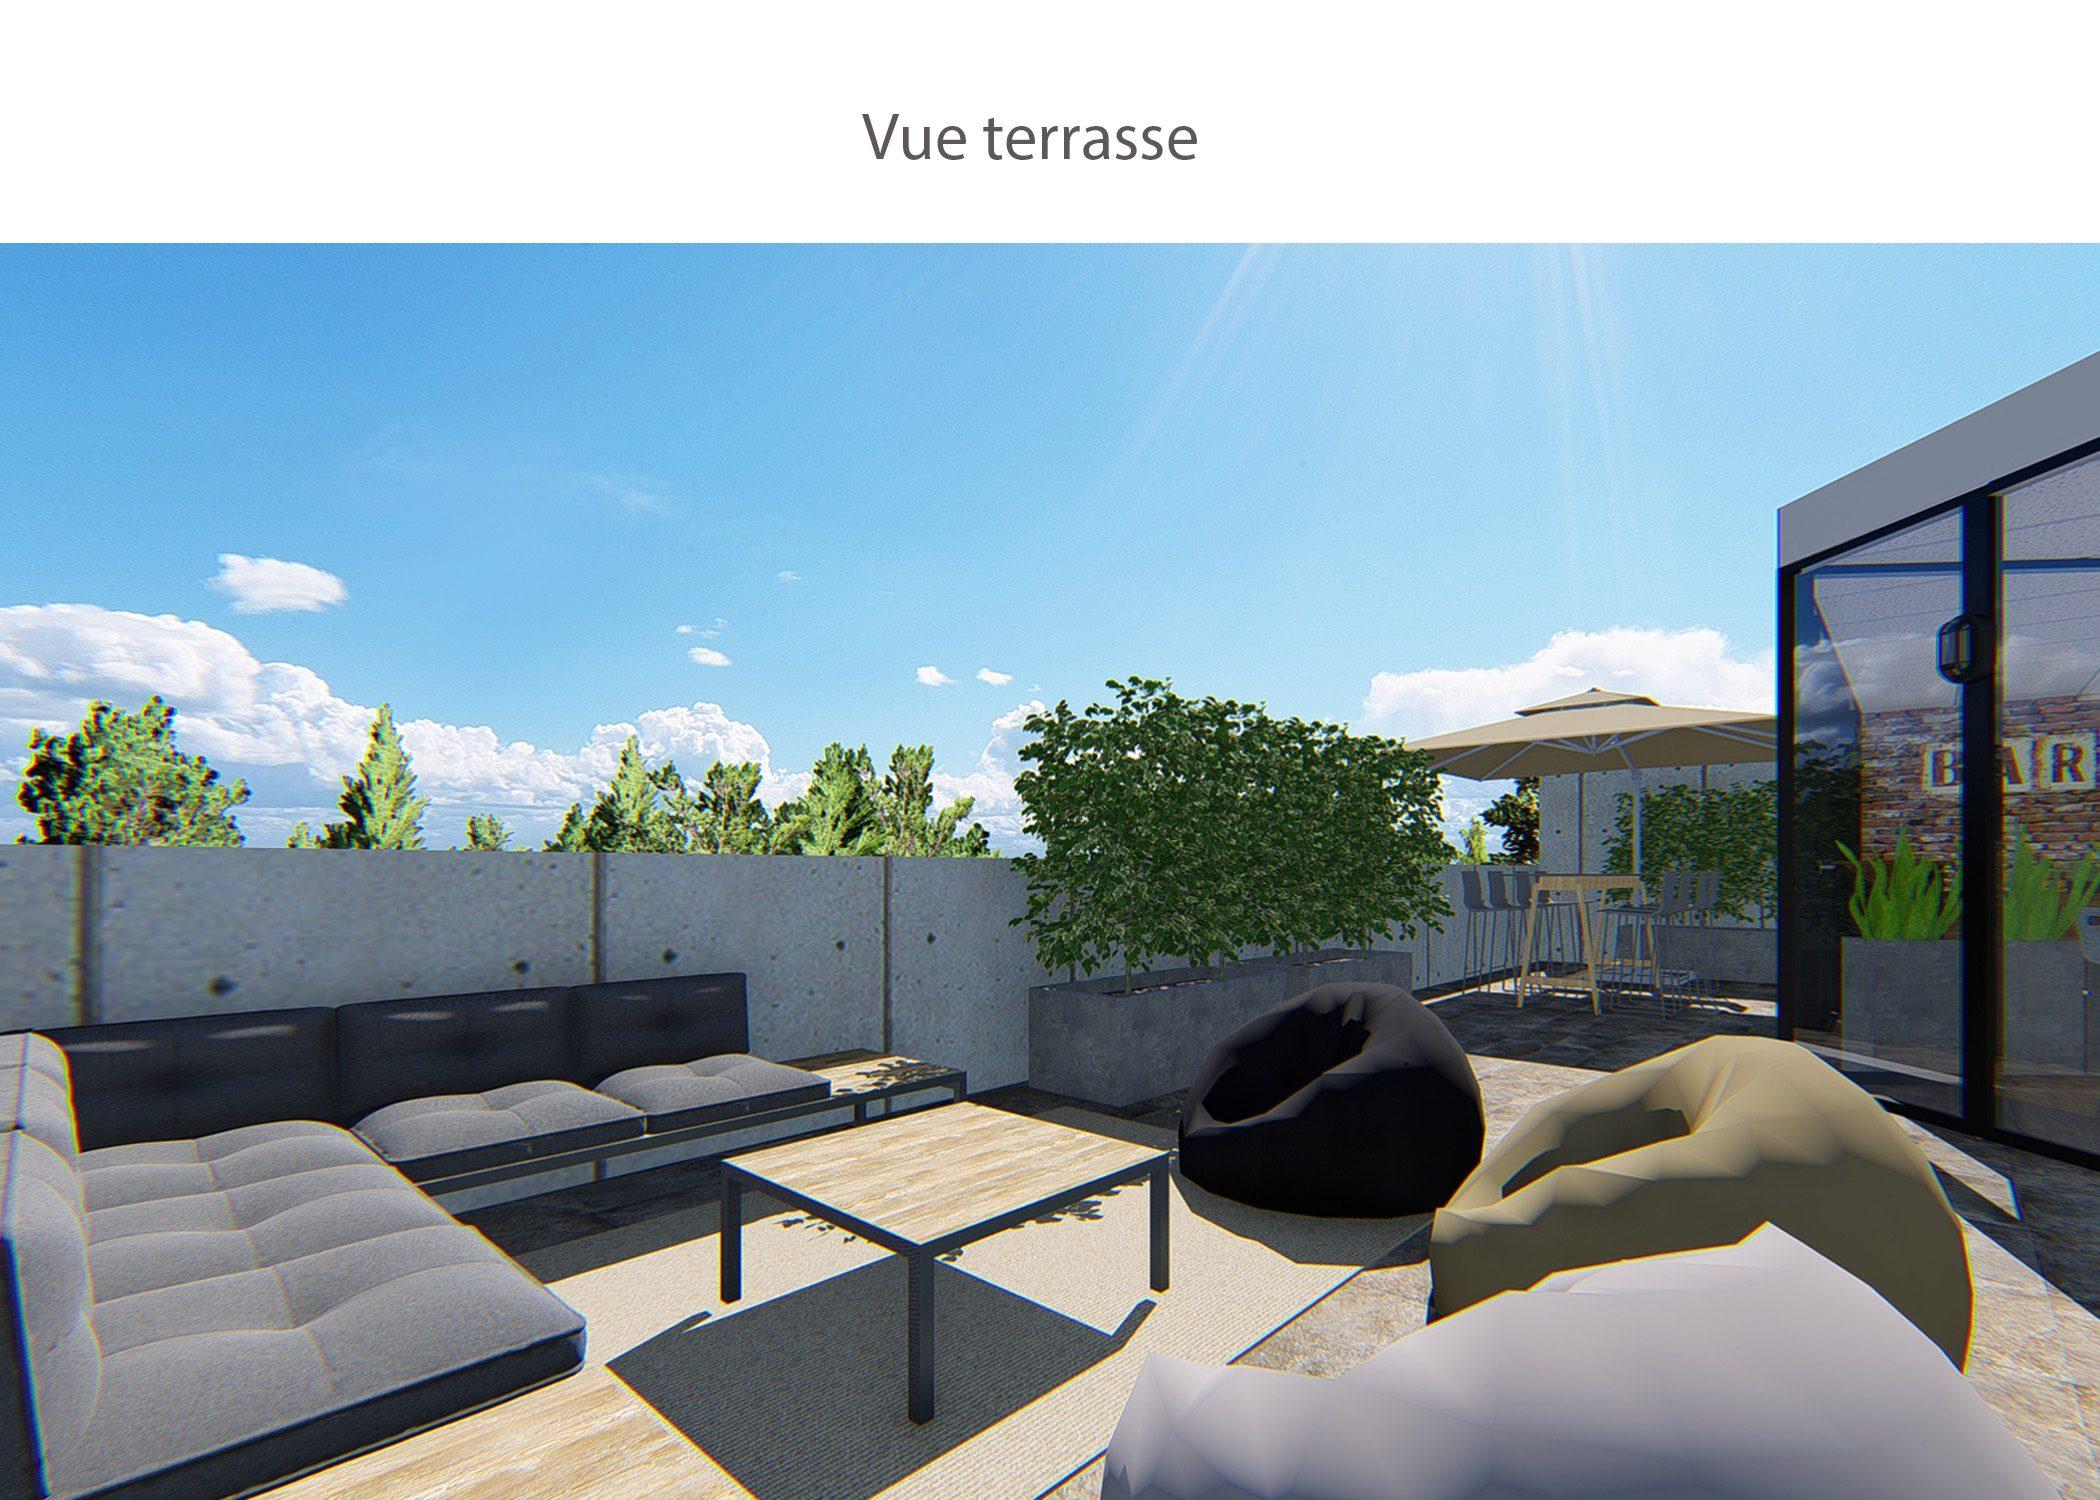 amenagement-decoration-start-up vente en ligne-region parisienne-terrasse-dekho design